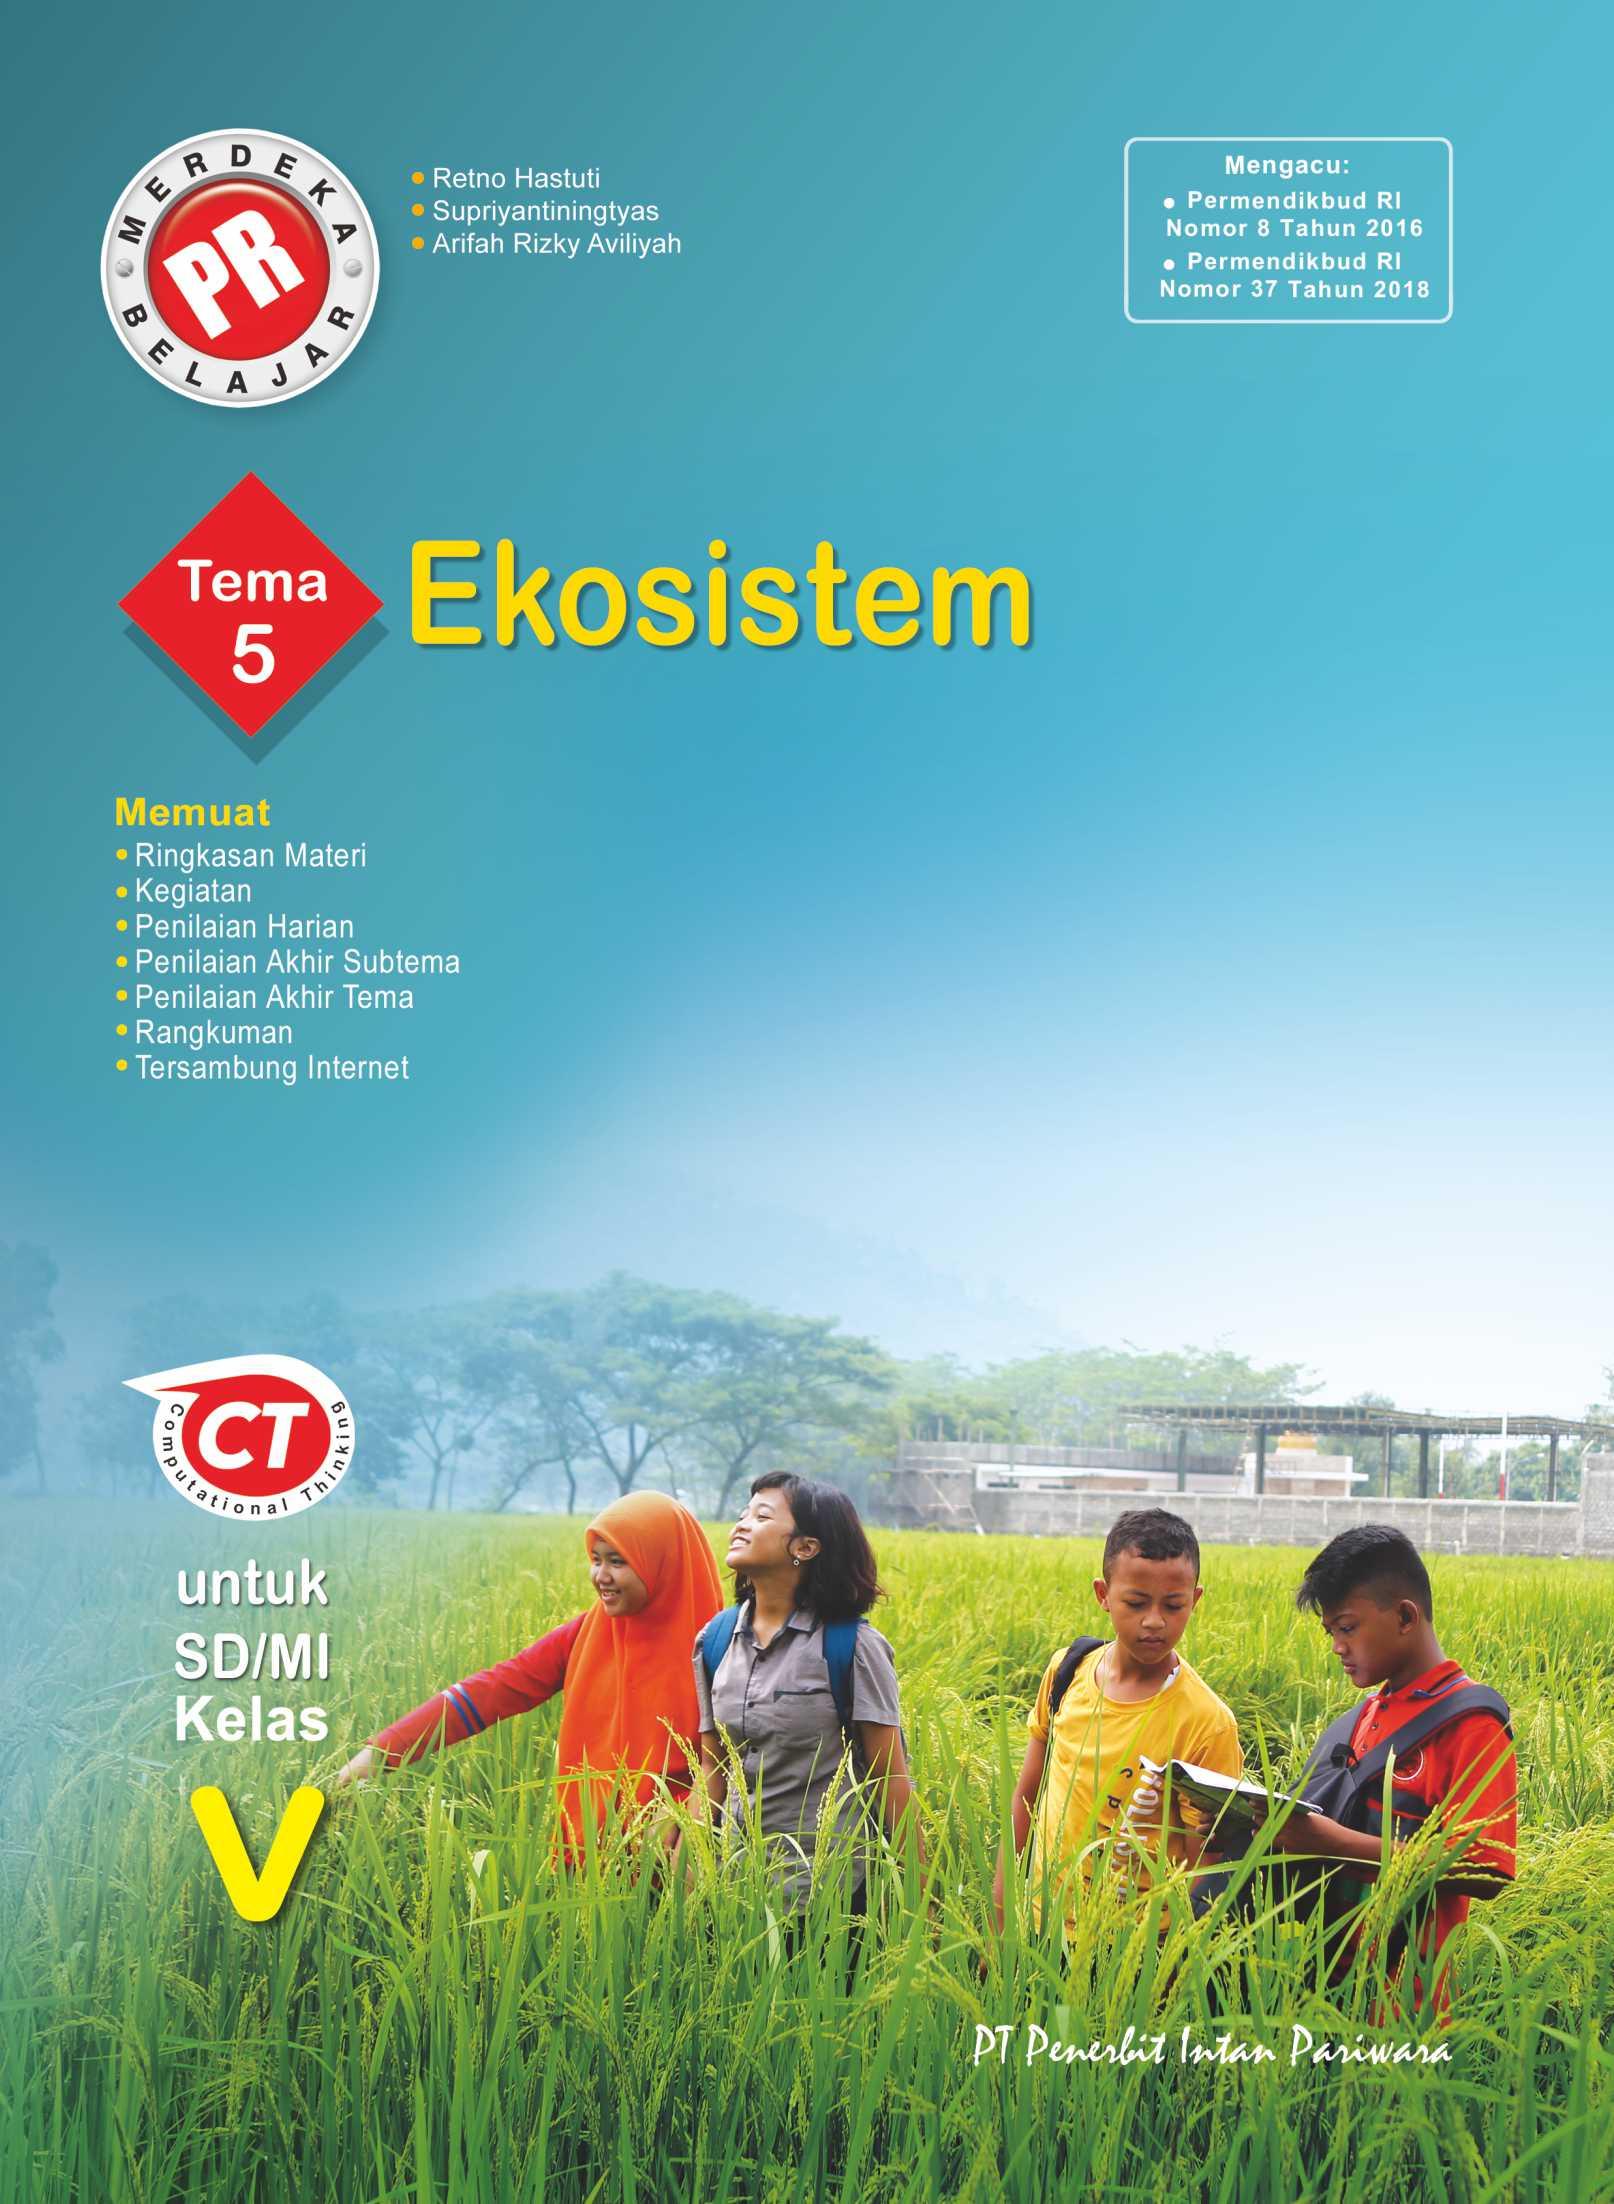 PR Kelas V Tema 5 Ekosistem Thn 2020/2021